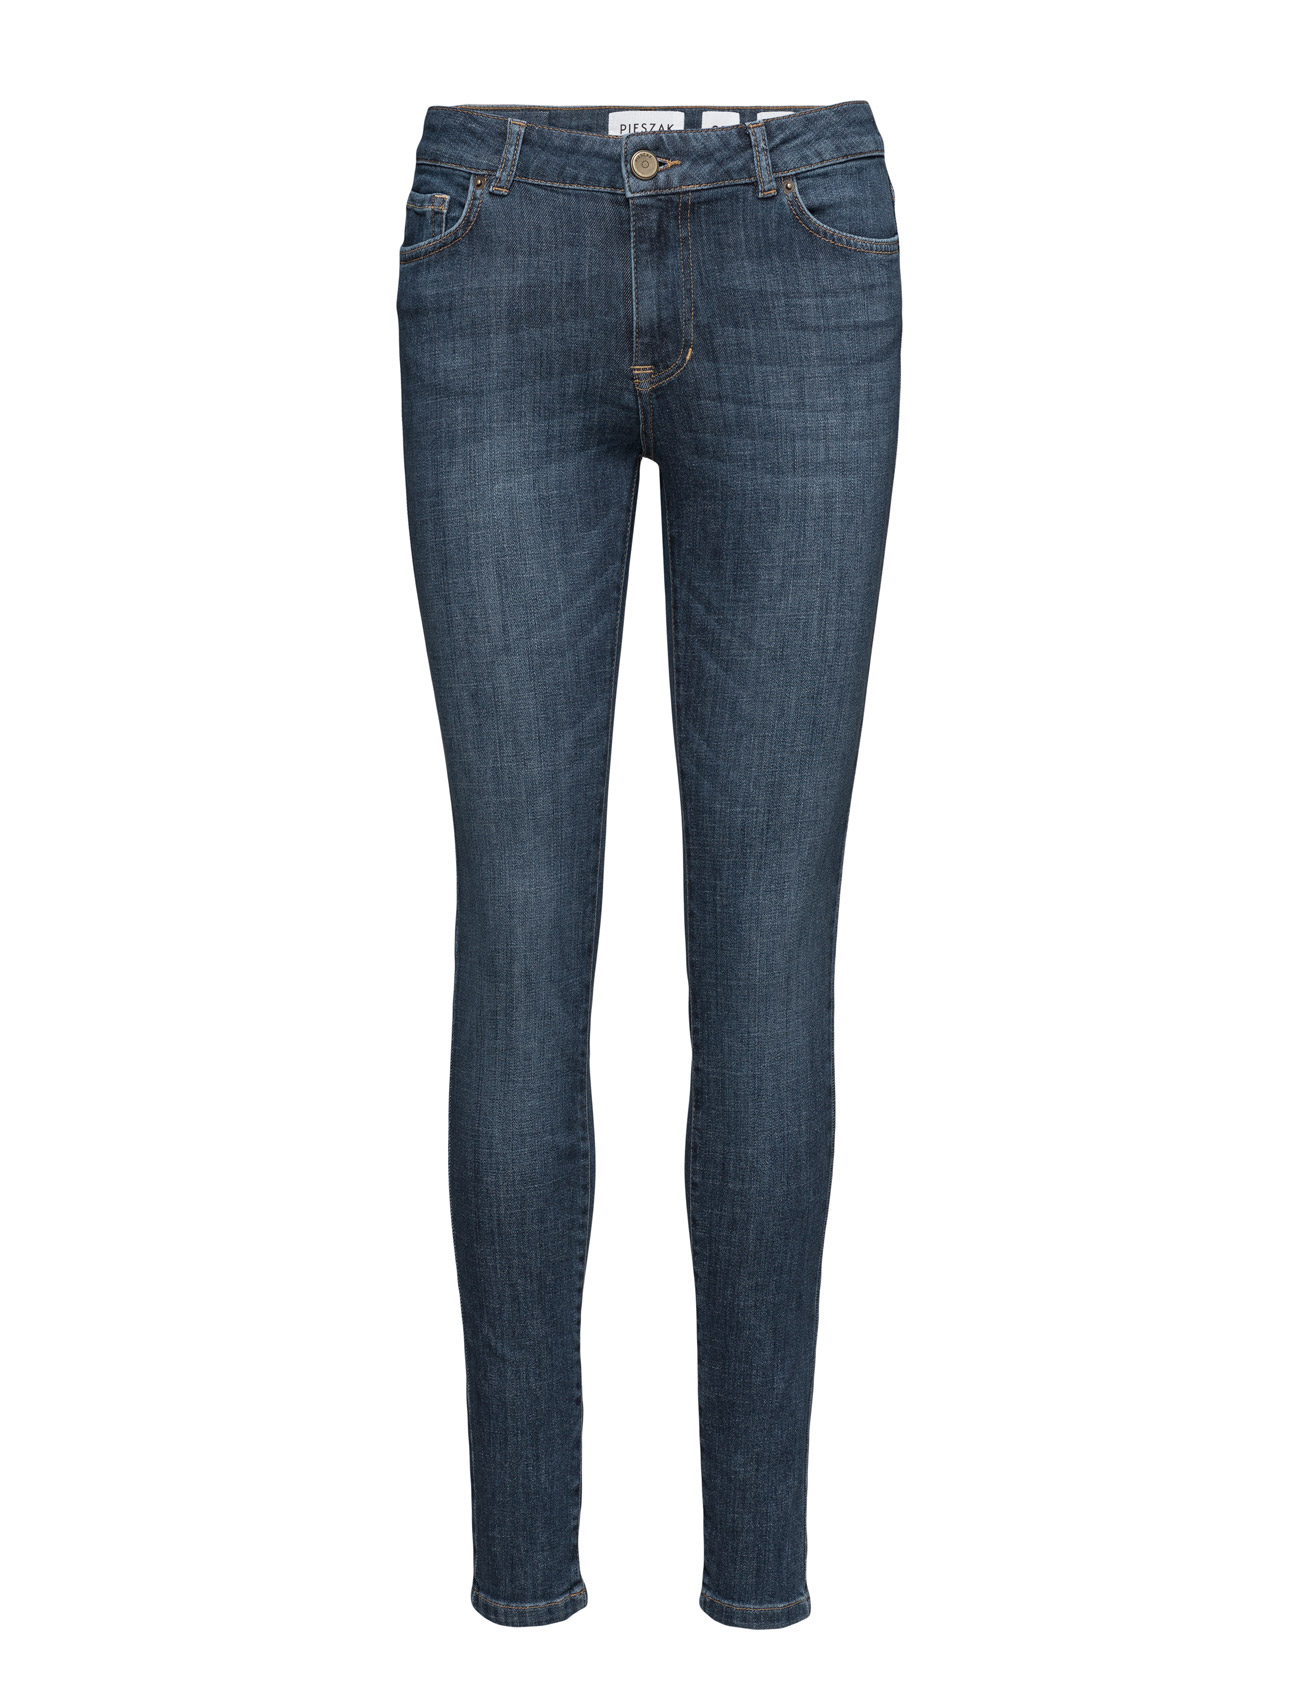 Pieszak Diva skinny wash Washington Jeans